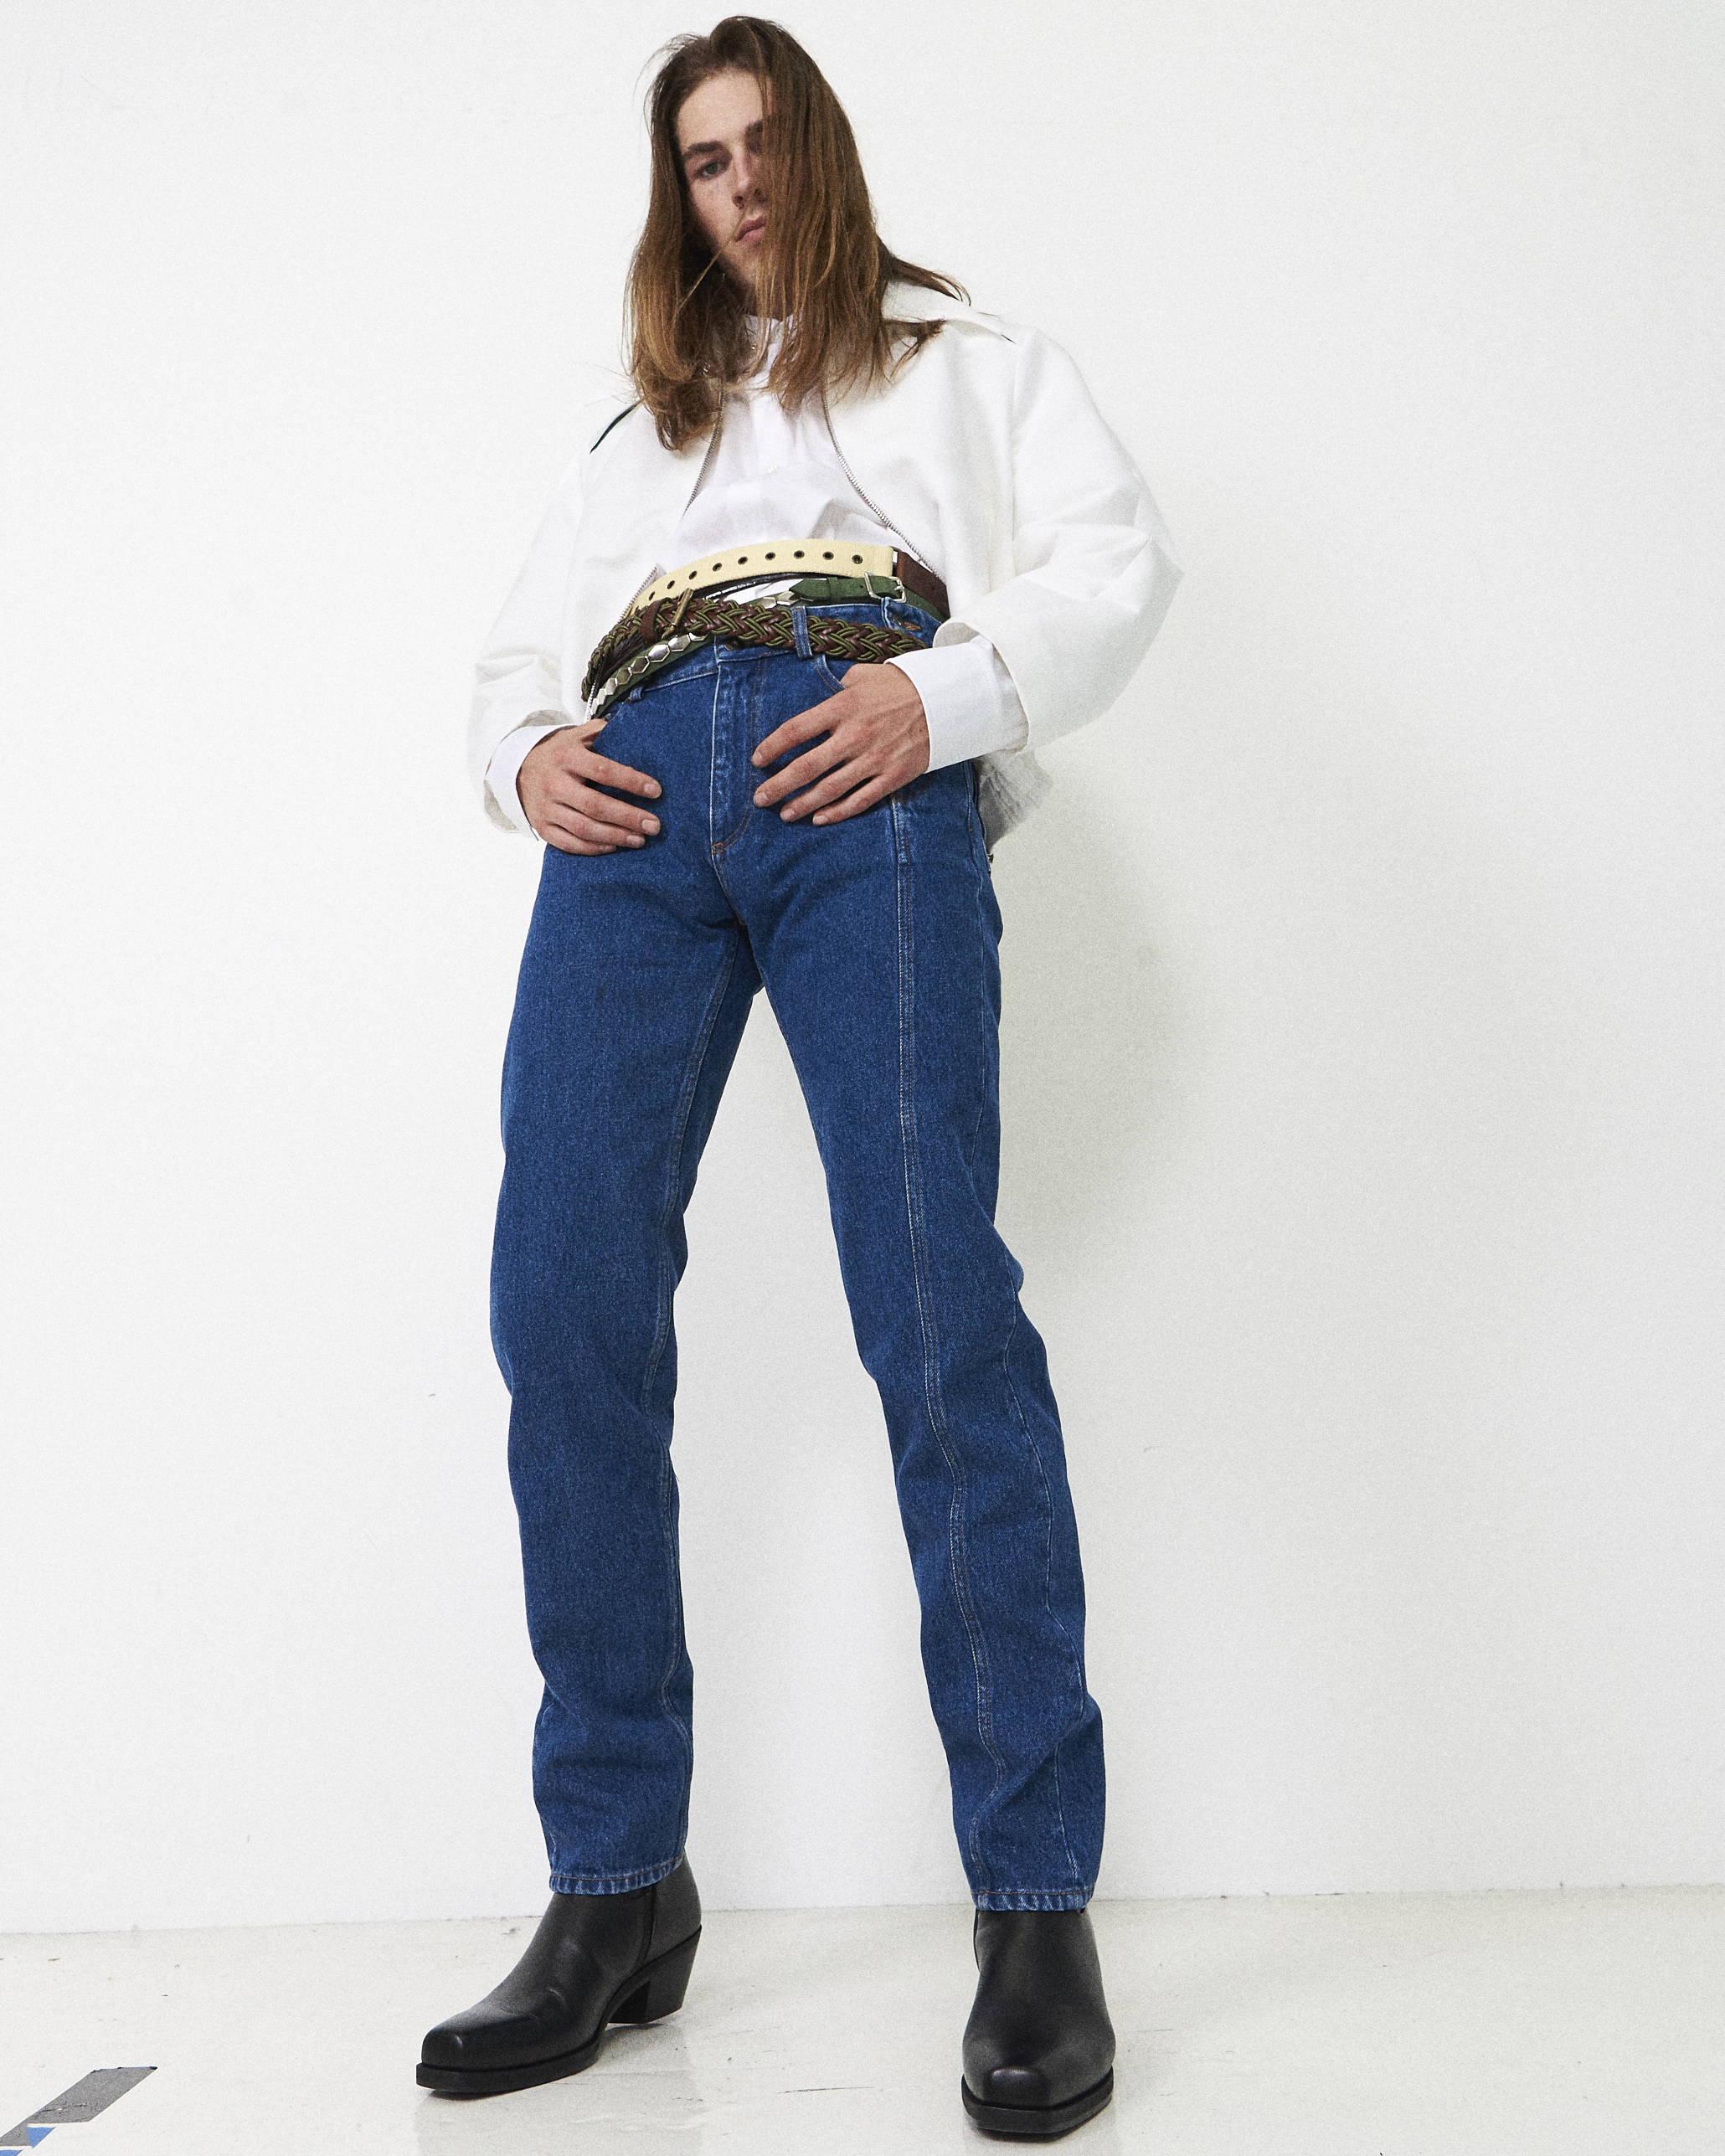 Y/Project Men Jeans SS18 Namacheko Cropped Jacket  - Hlorenzo